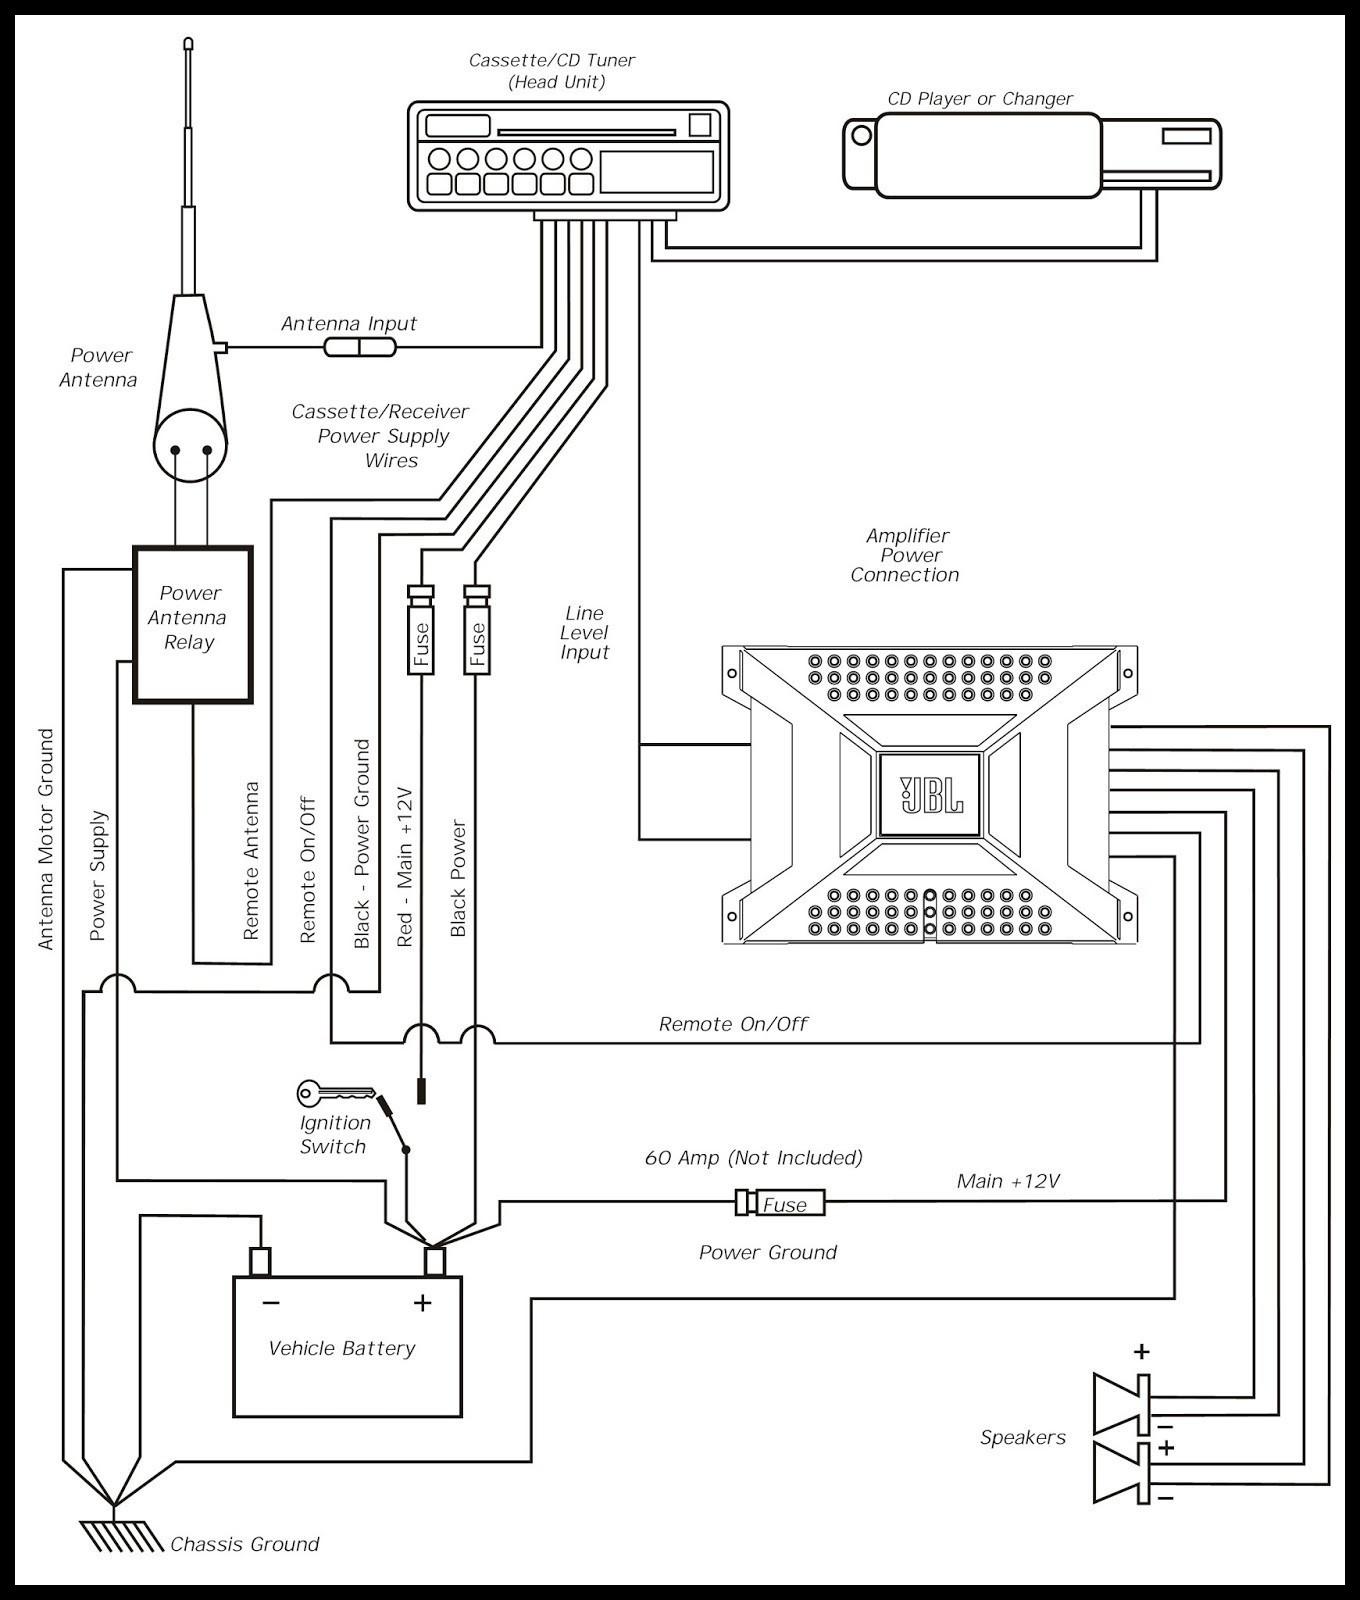 1999 Toyota Camry Headlight Wiring Diagram 2018 25 Best Circuit Diagram